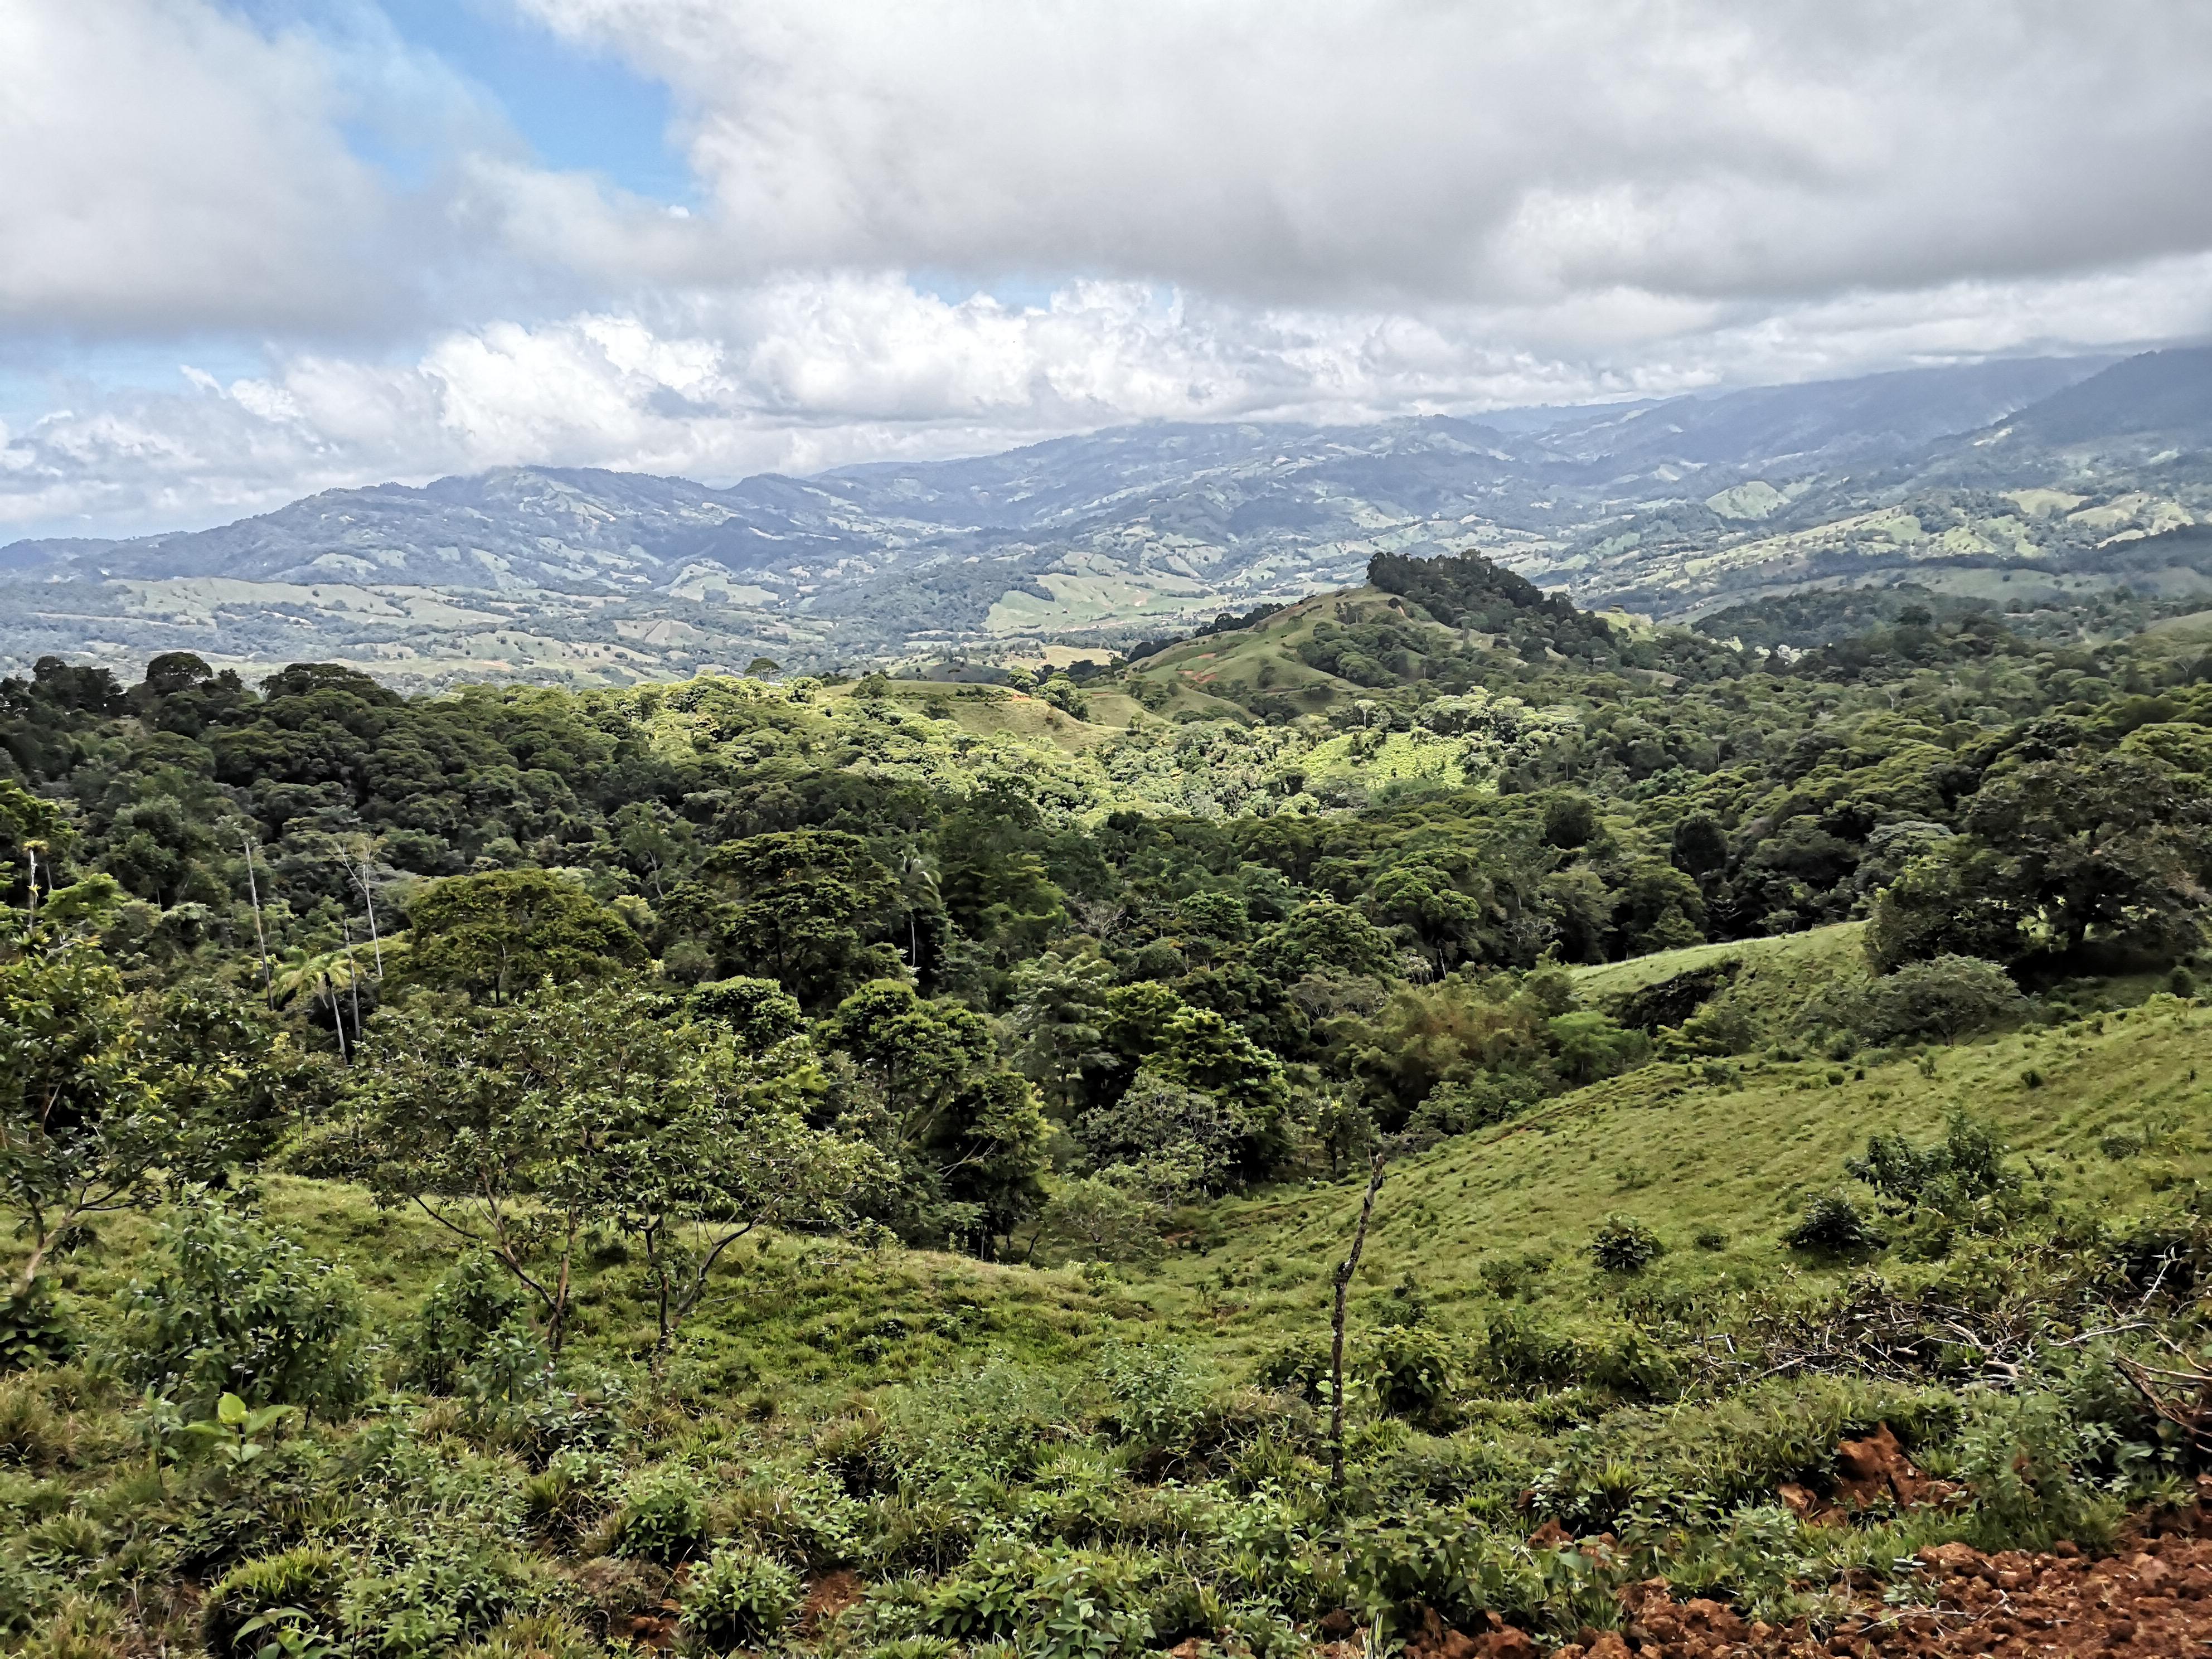 Lot with beautiful mountain views in Platanillo, Baru